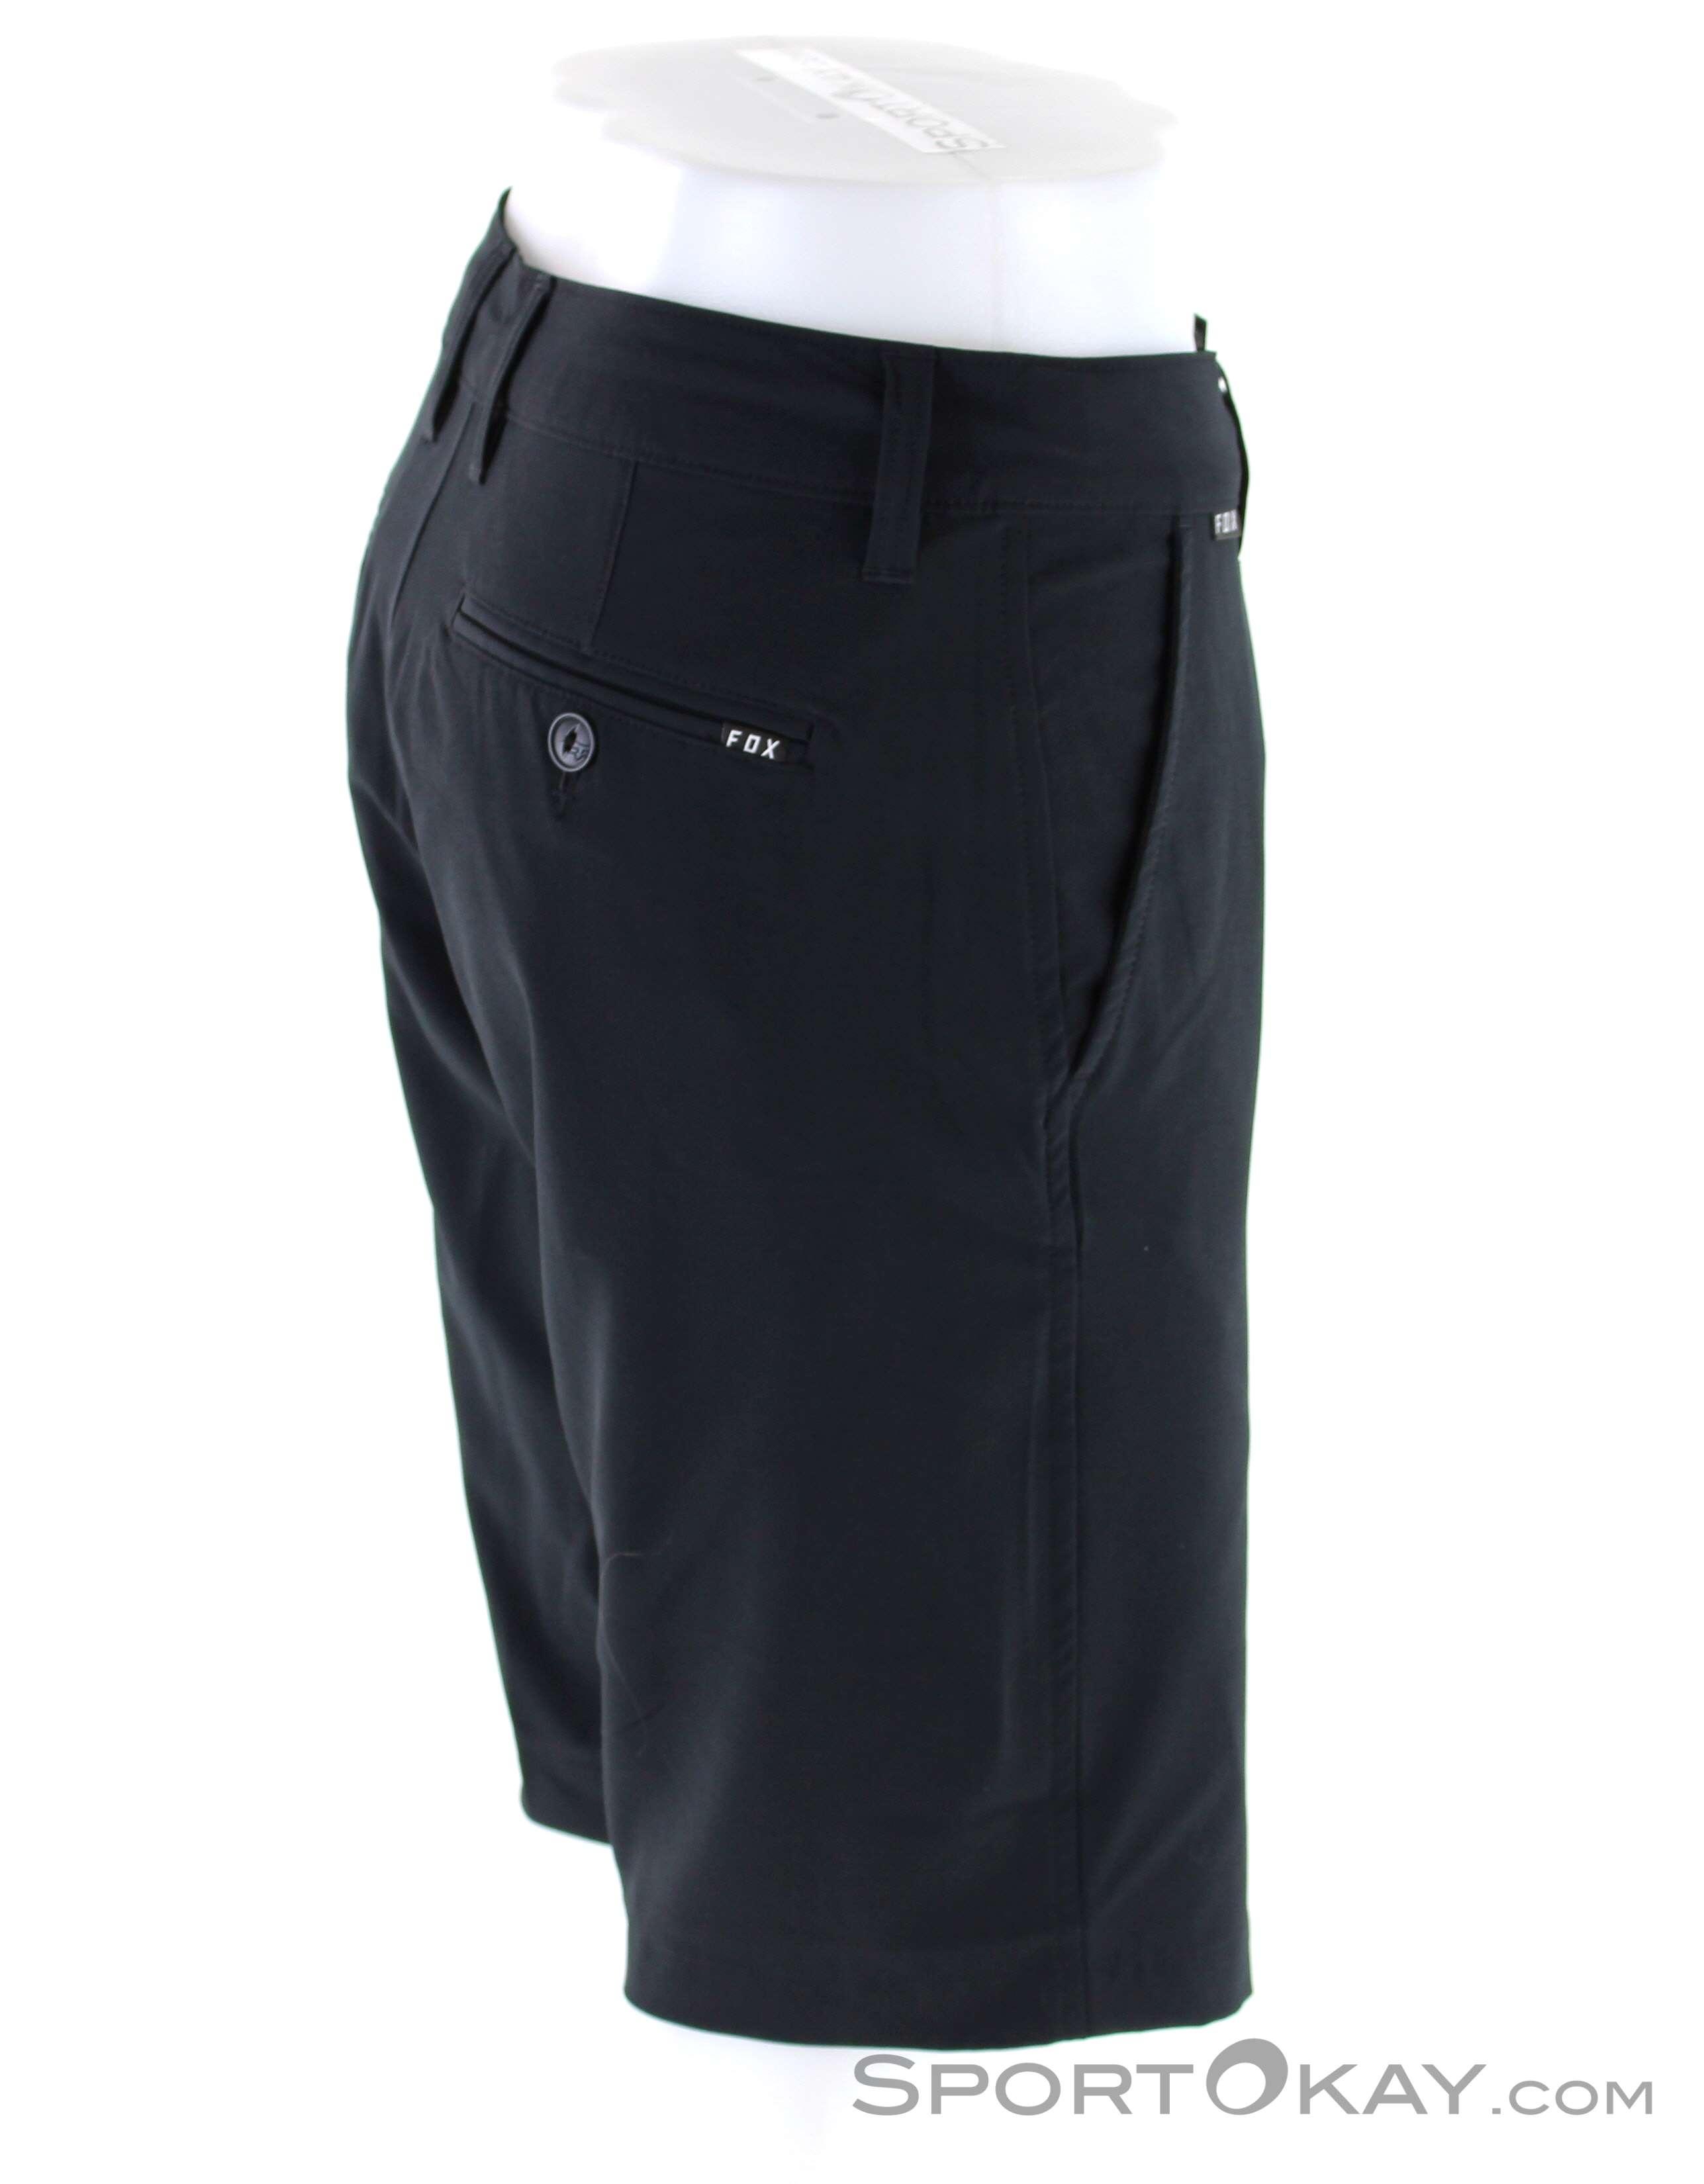 9b629313ef00 Fox Essex Tech Stretch Short Uomo Pantaloncini da Bici , Fox, Nero, , Uomo